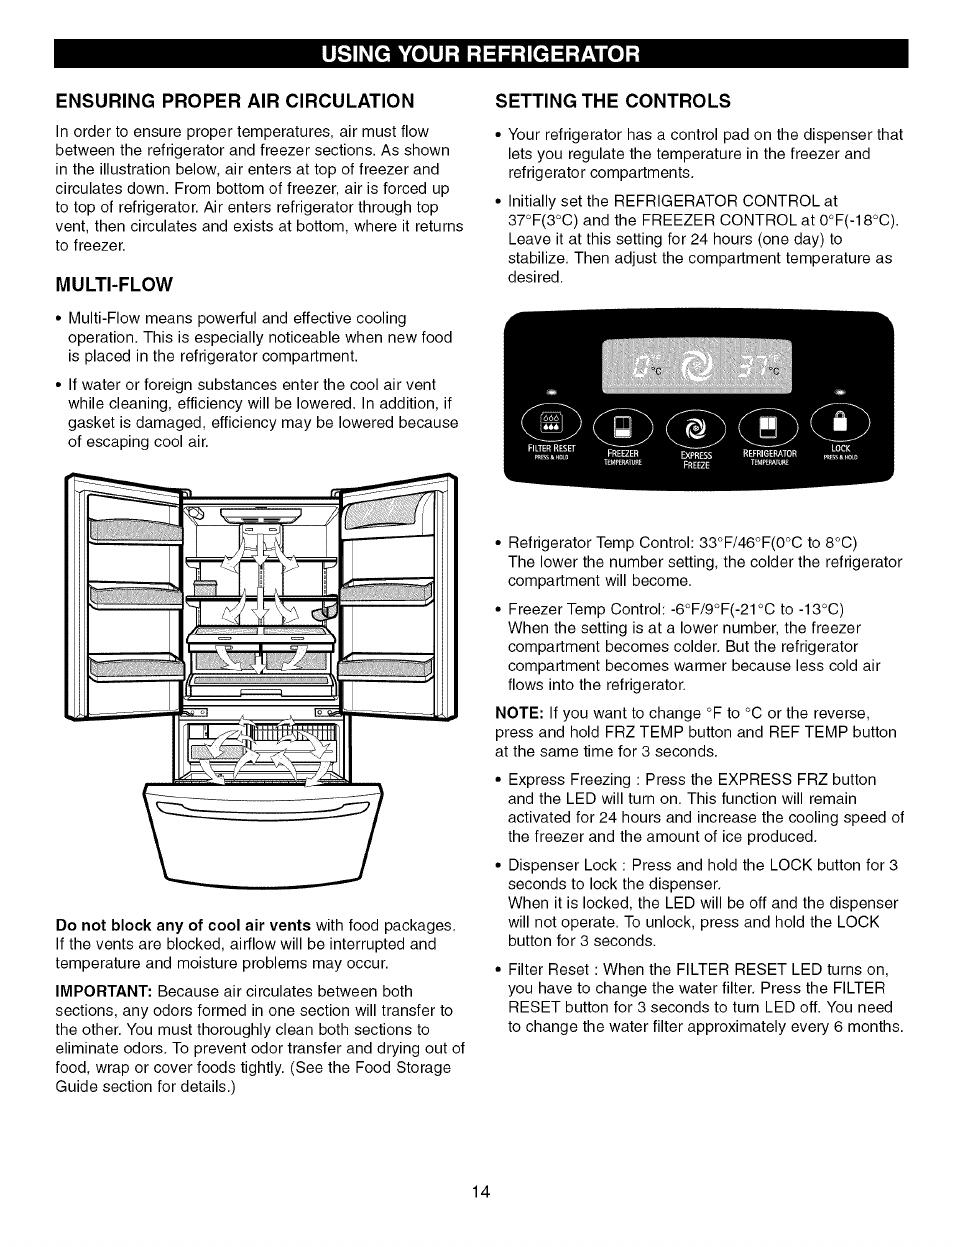 Ensuring proper air circulation, Multi-flow, Setting the controls